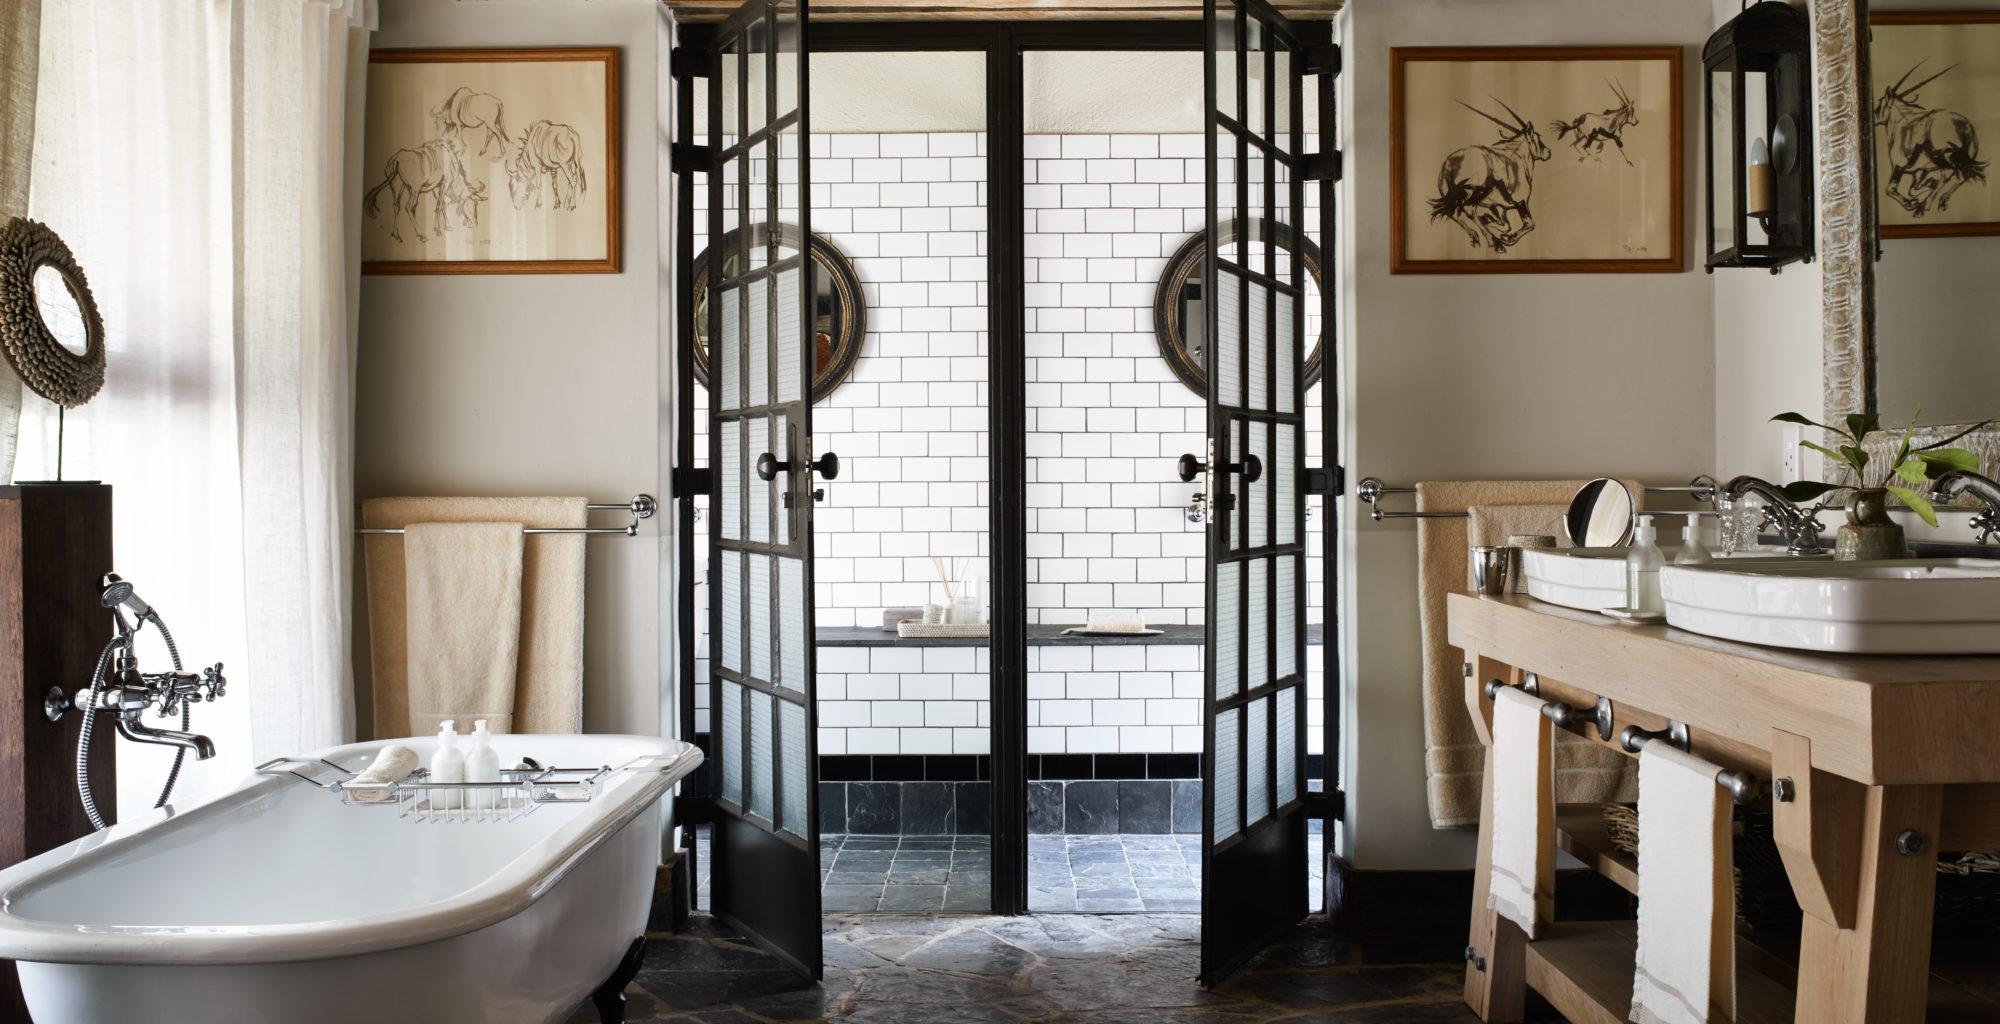 South-Africa-Singita-Castleton-Bathroom